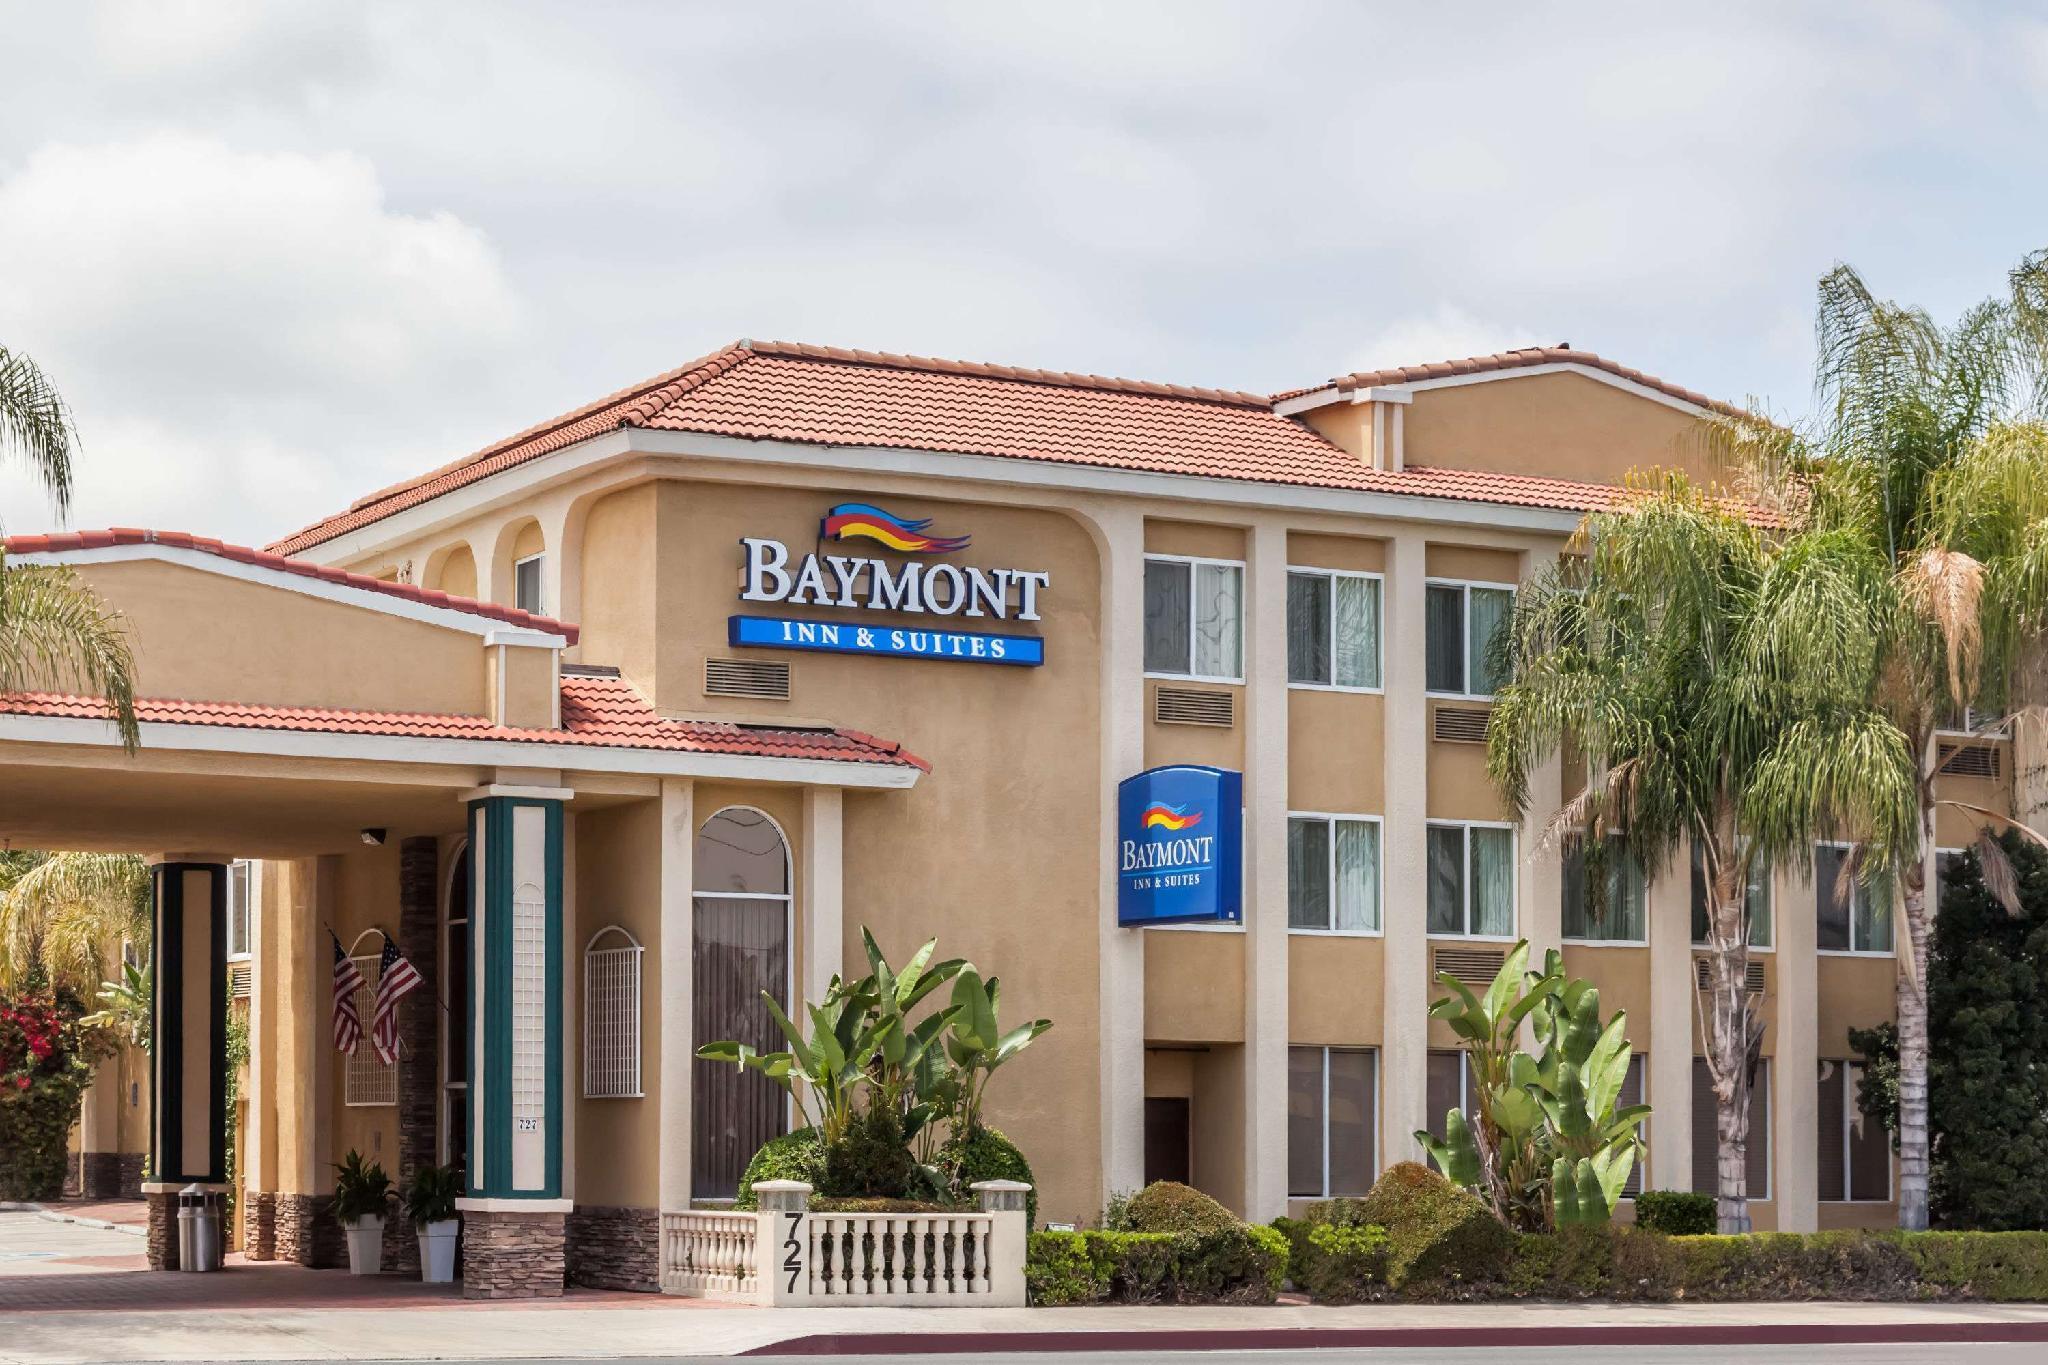 Baymont By Wyndham Anaheim